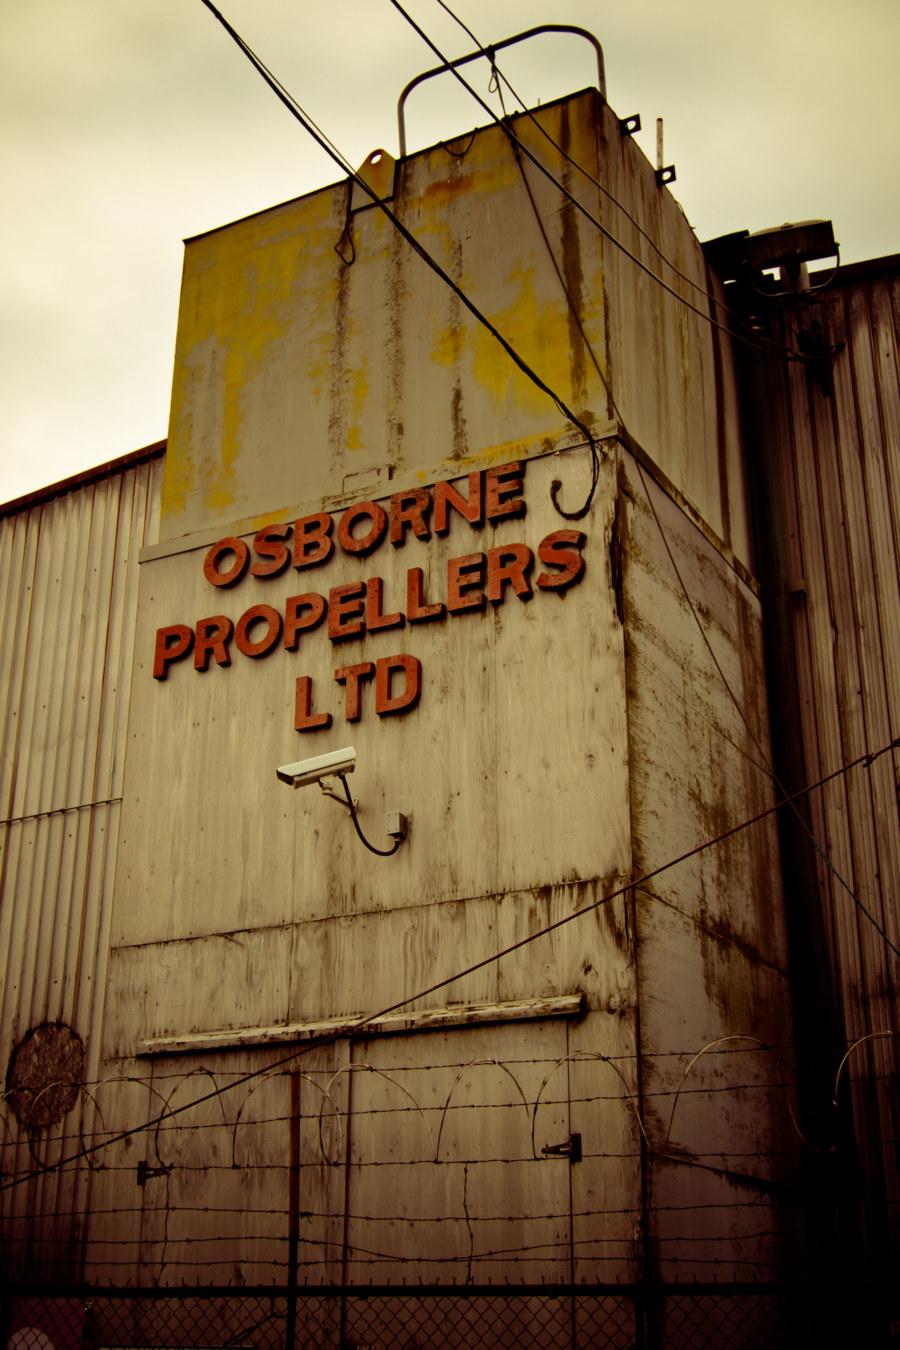 Osborne Propellers Ltd